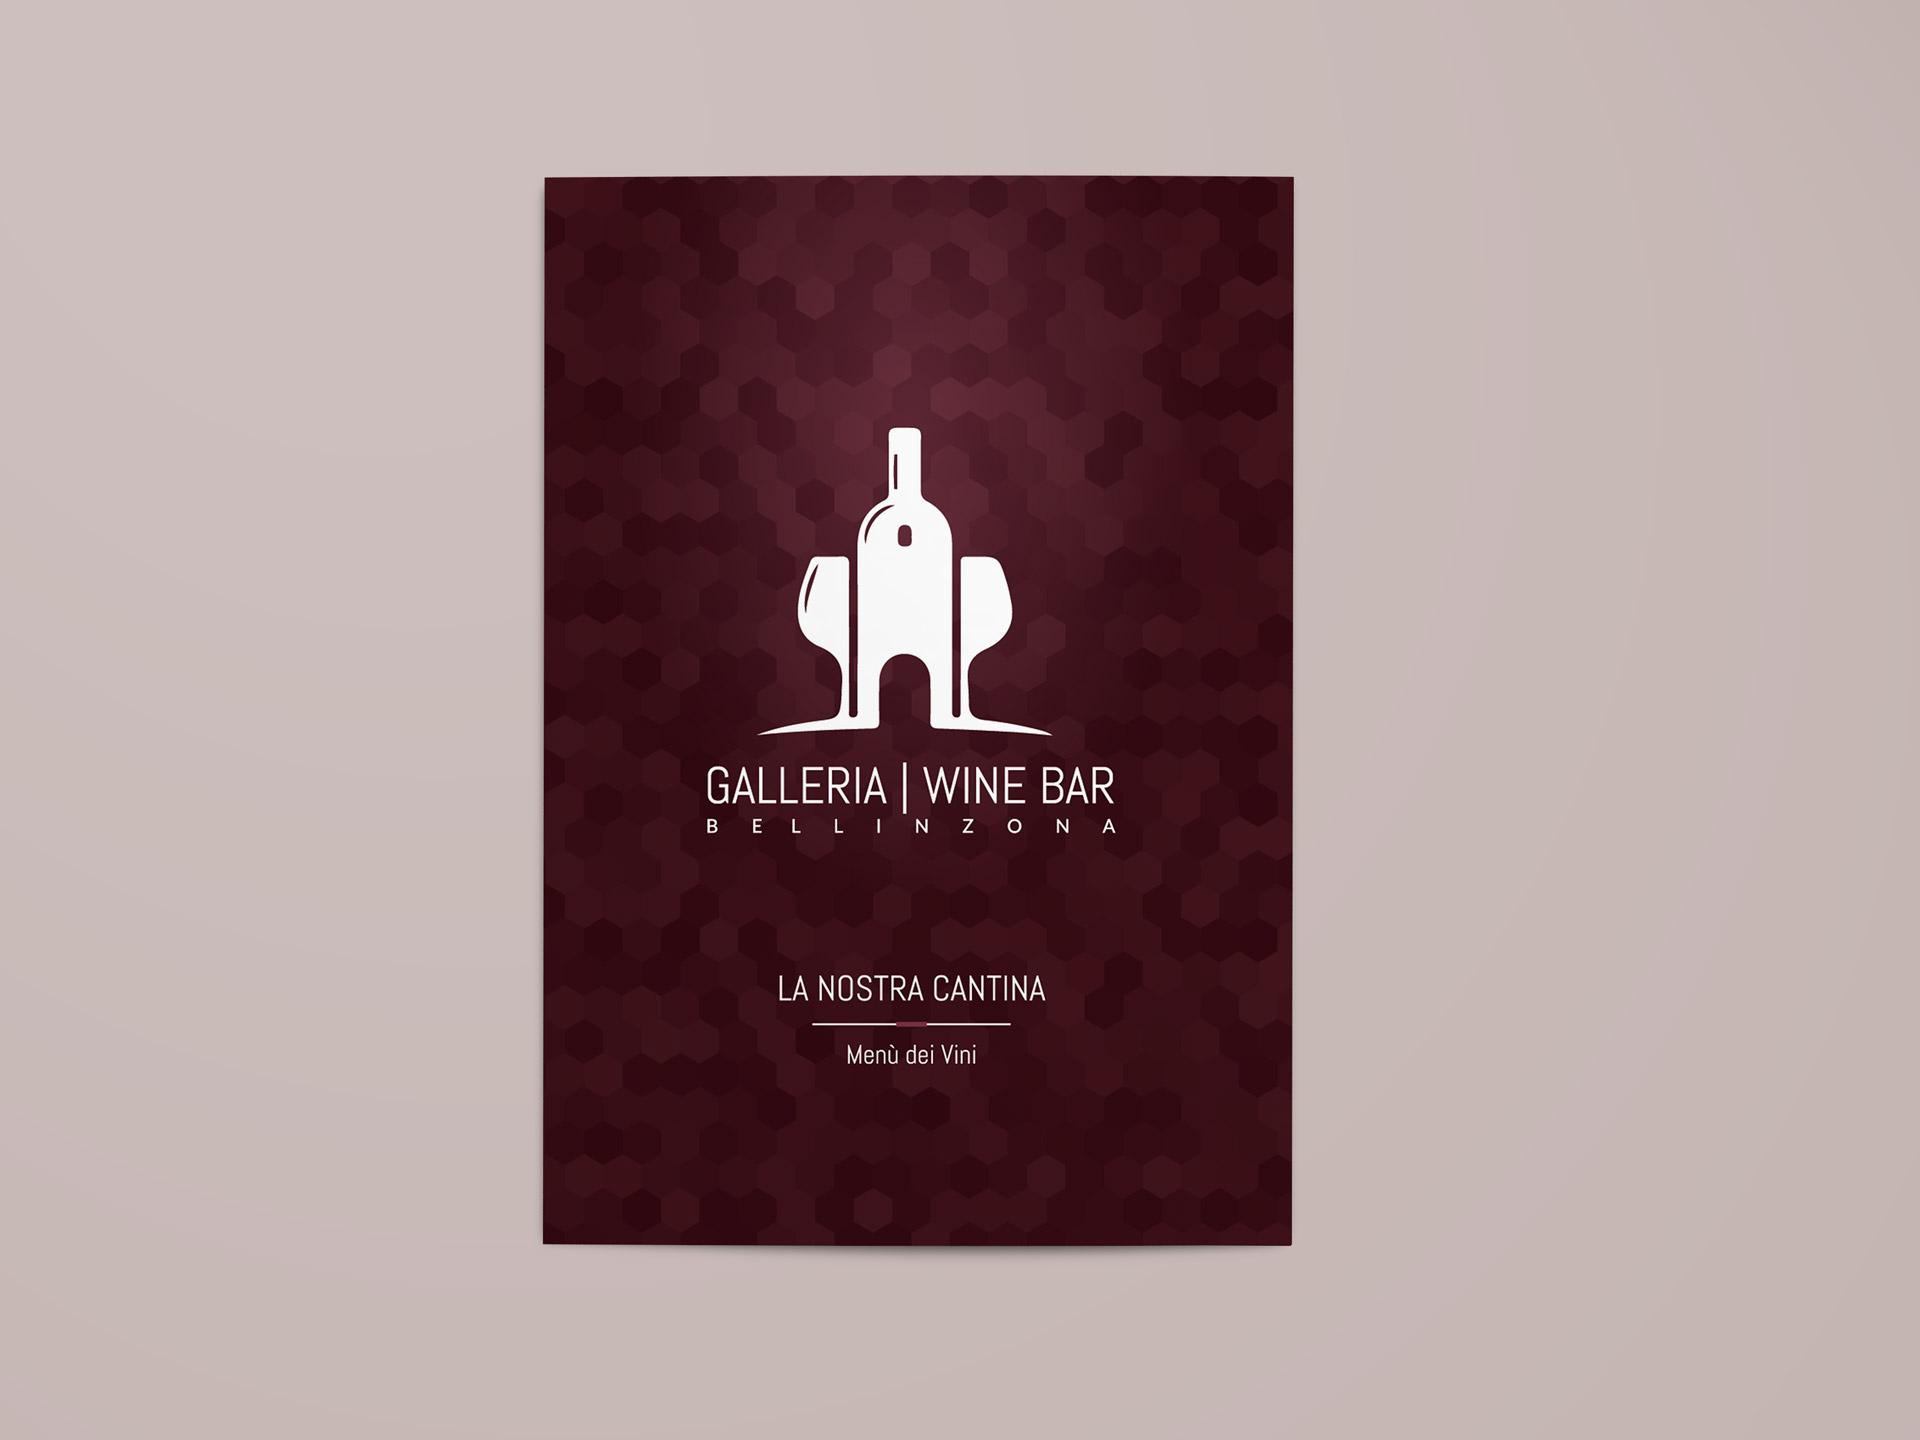 menu-vini-galleria-winebar-bellinzona-4